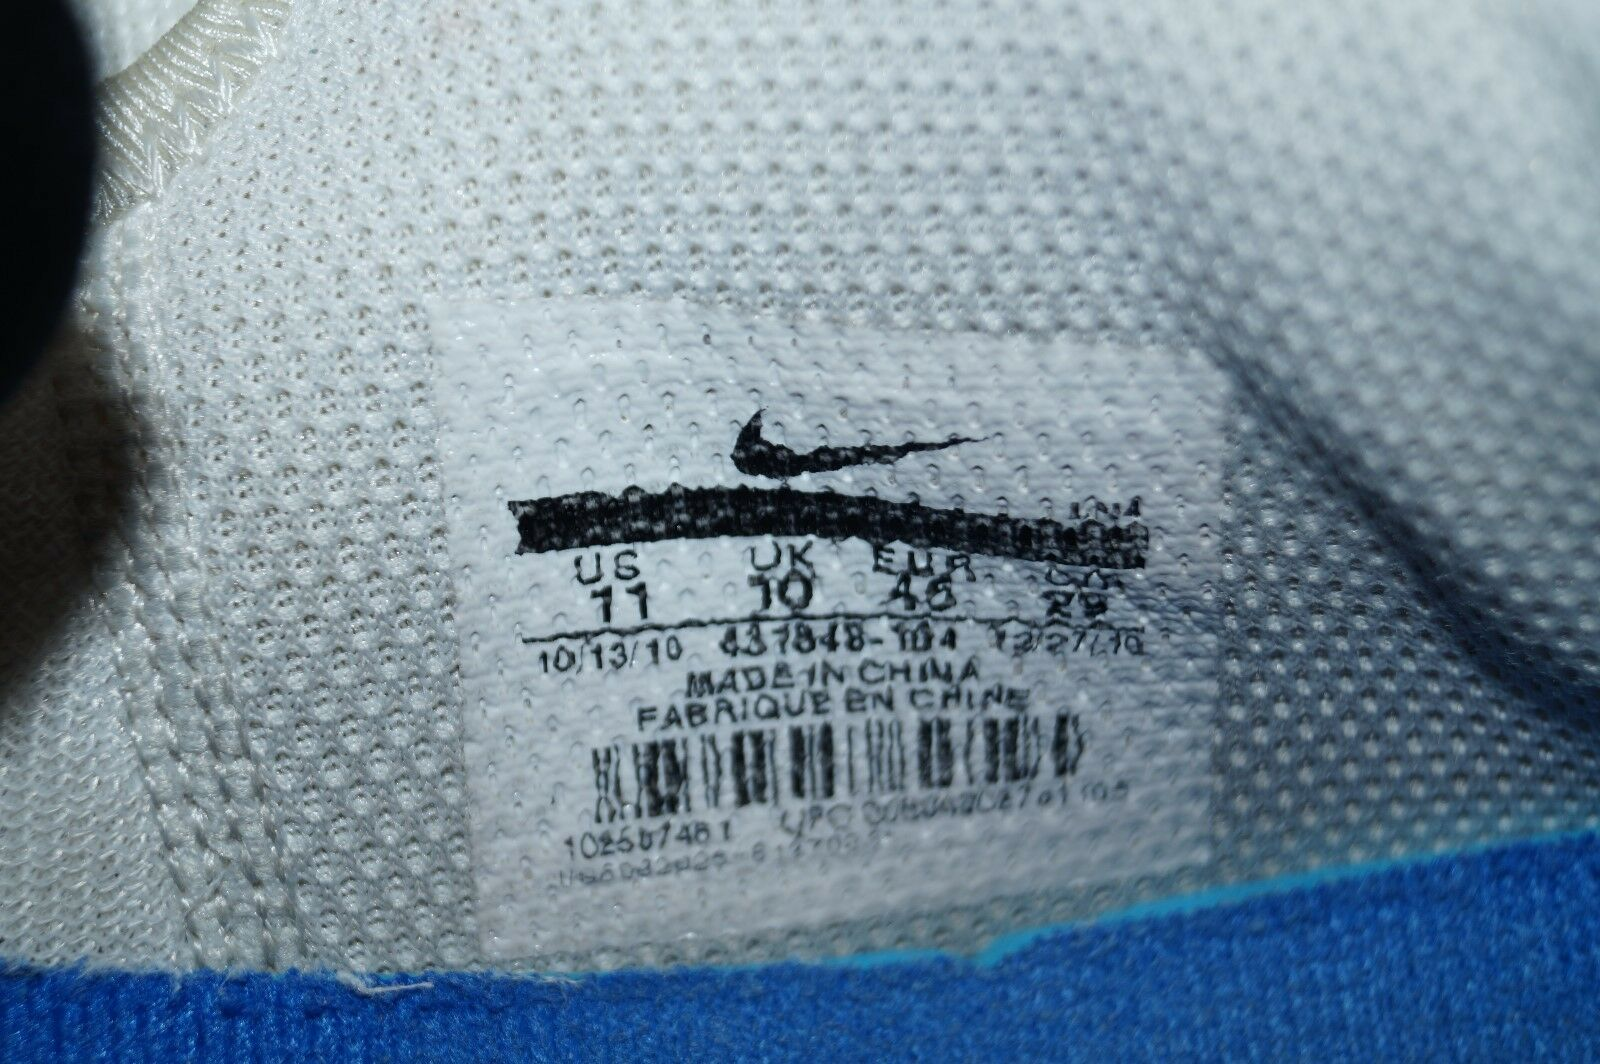 Nike Trainer 1.2 1.2 1.2 Flywire 45 - 44,5   US 11 Running Laufzapatos 059118